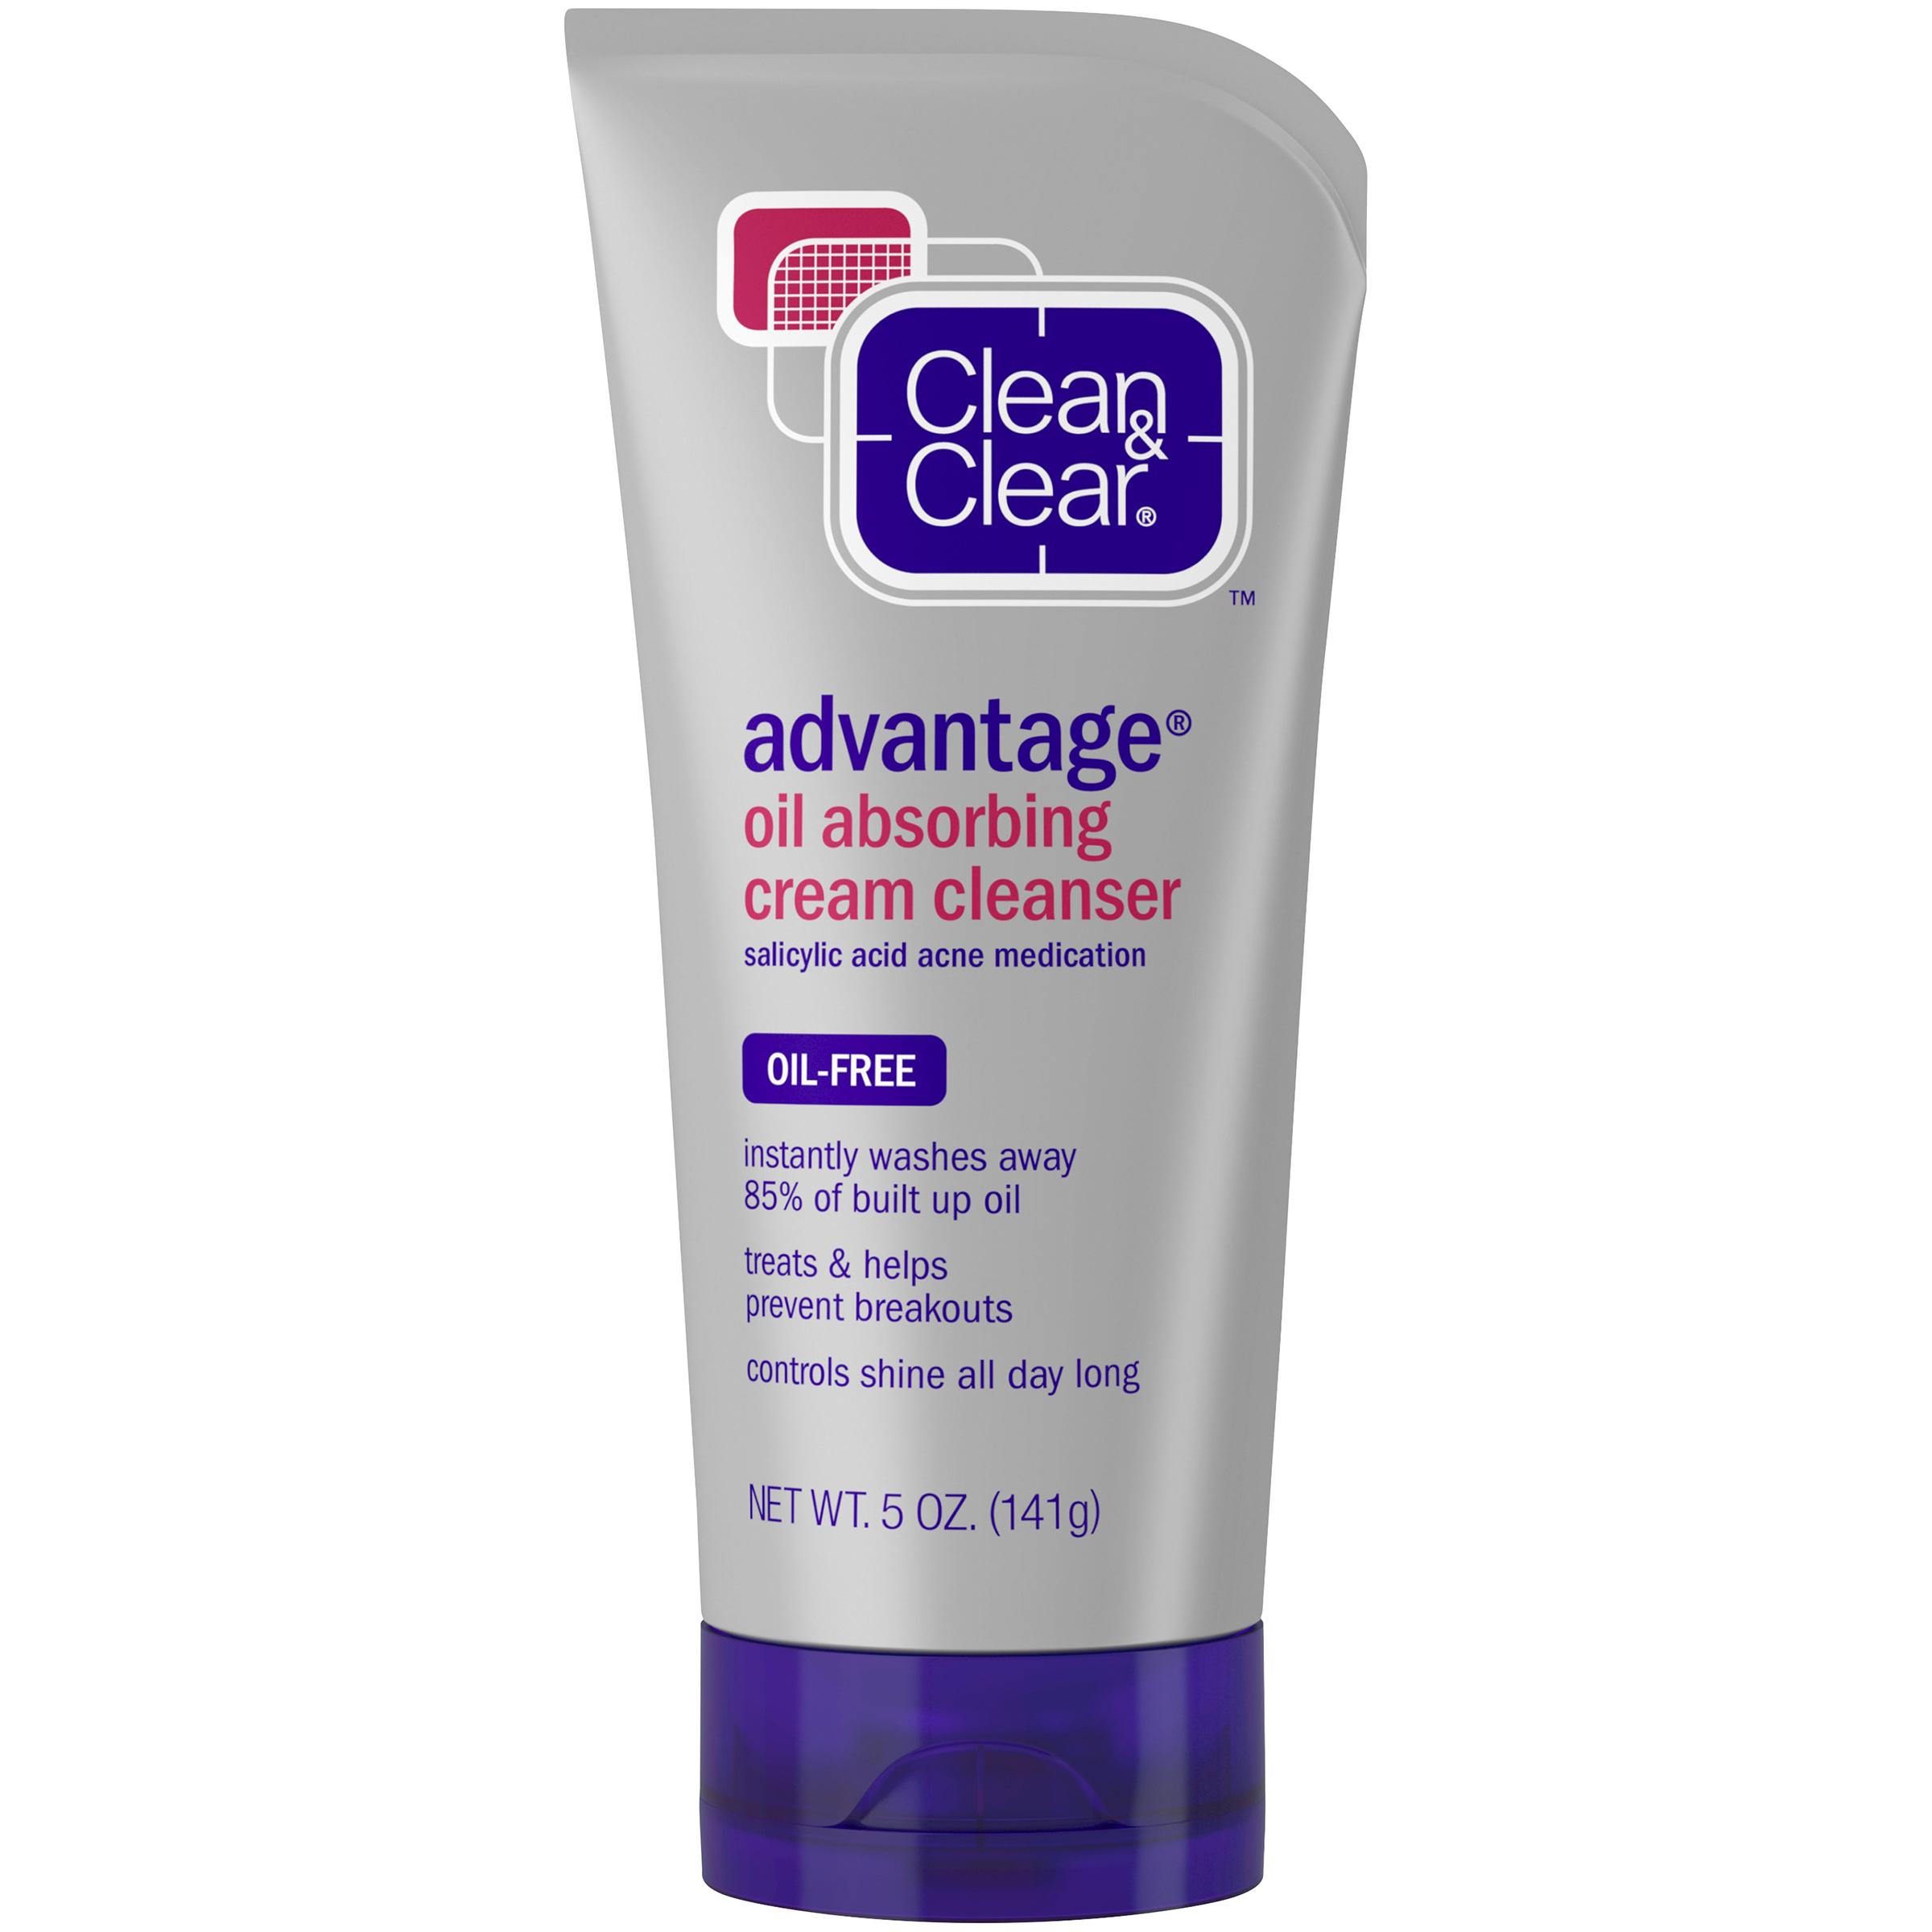 Clean & Clear Advantage Oil-Absorbing Cream Cleanser 0.5 oz PartNumber: 015W004923153001P KsnValue: 4923153 MfgPartNumber: 110240800